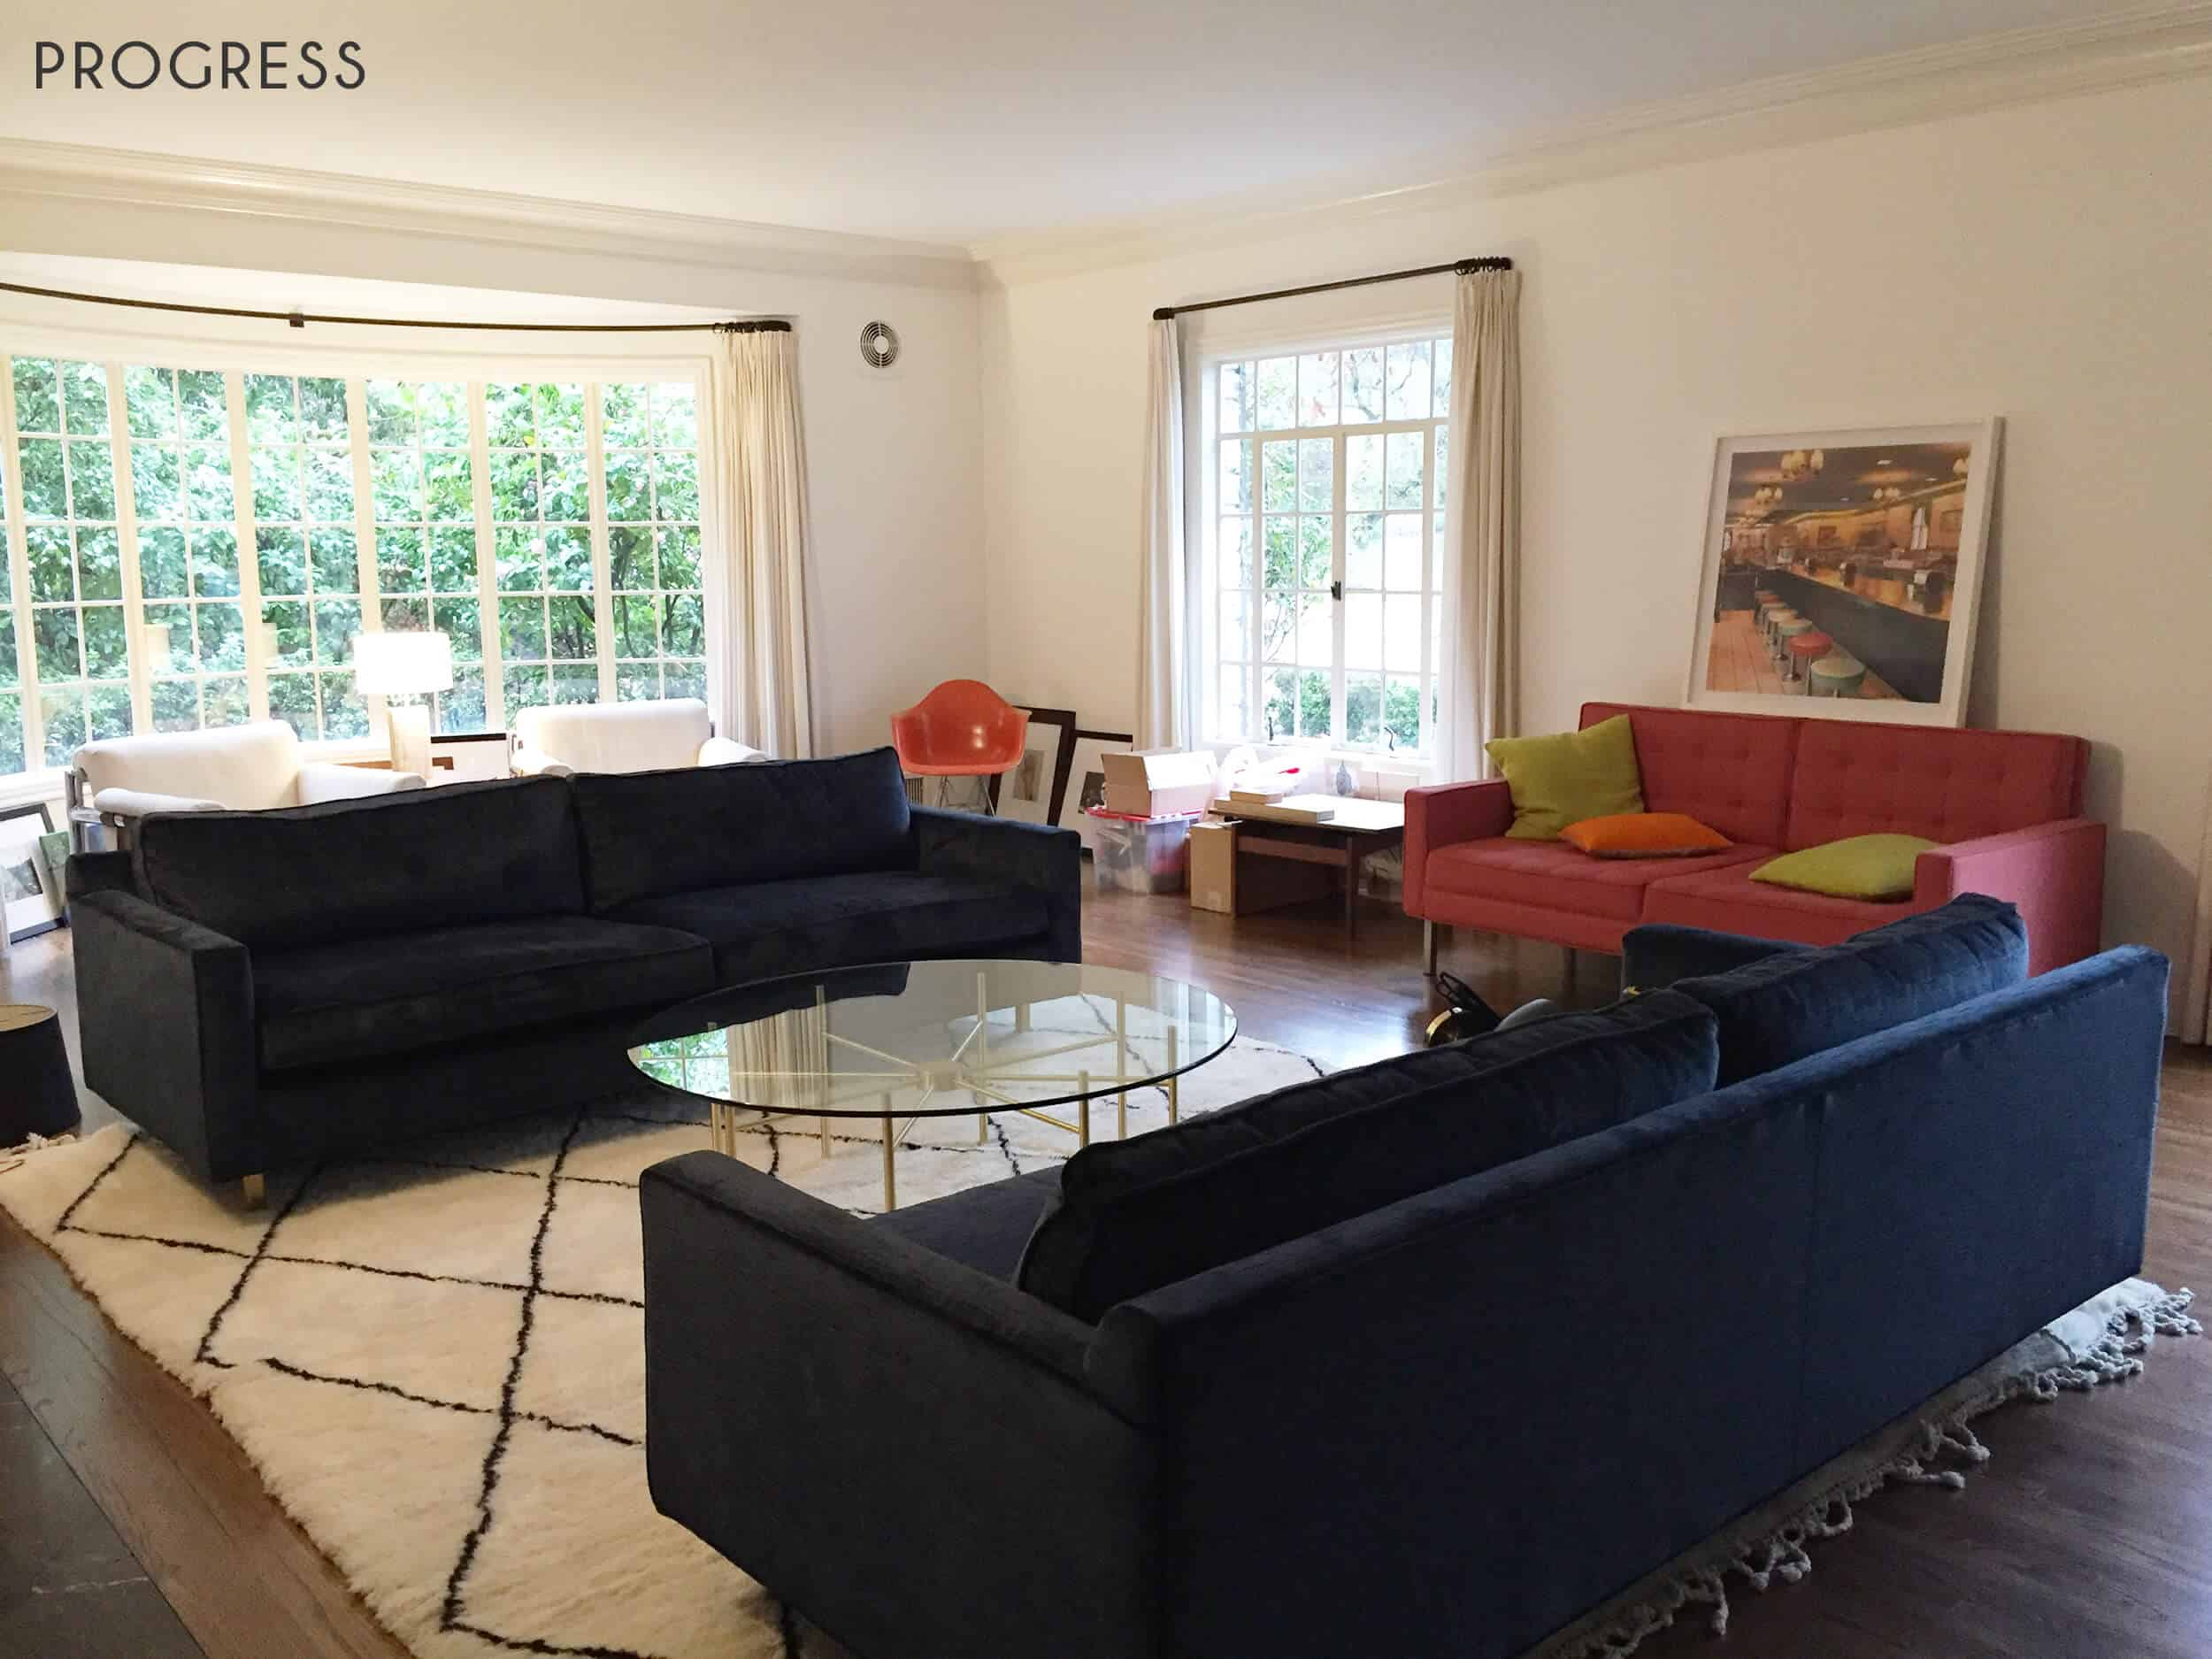 Emily-Henderson_Griffith-Park-Home_Traditional_Italian_Mid-Century_Living_Room_Progress_21